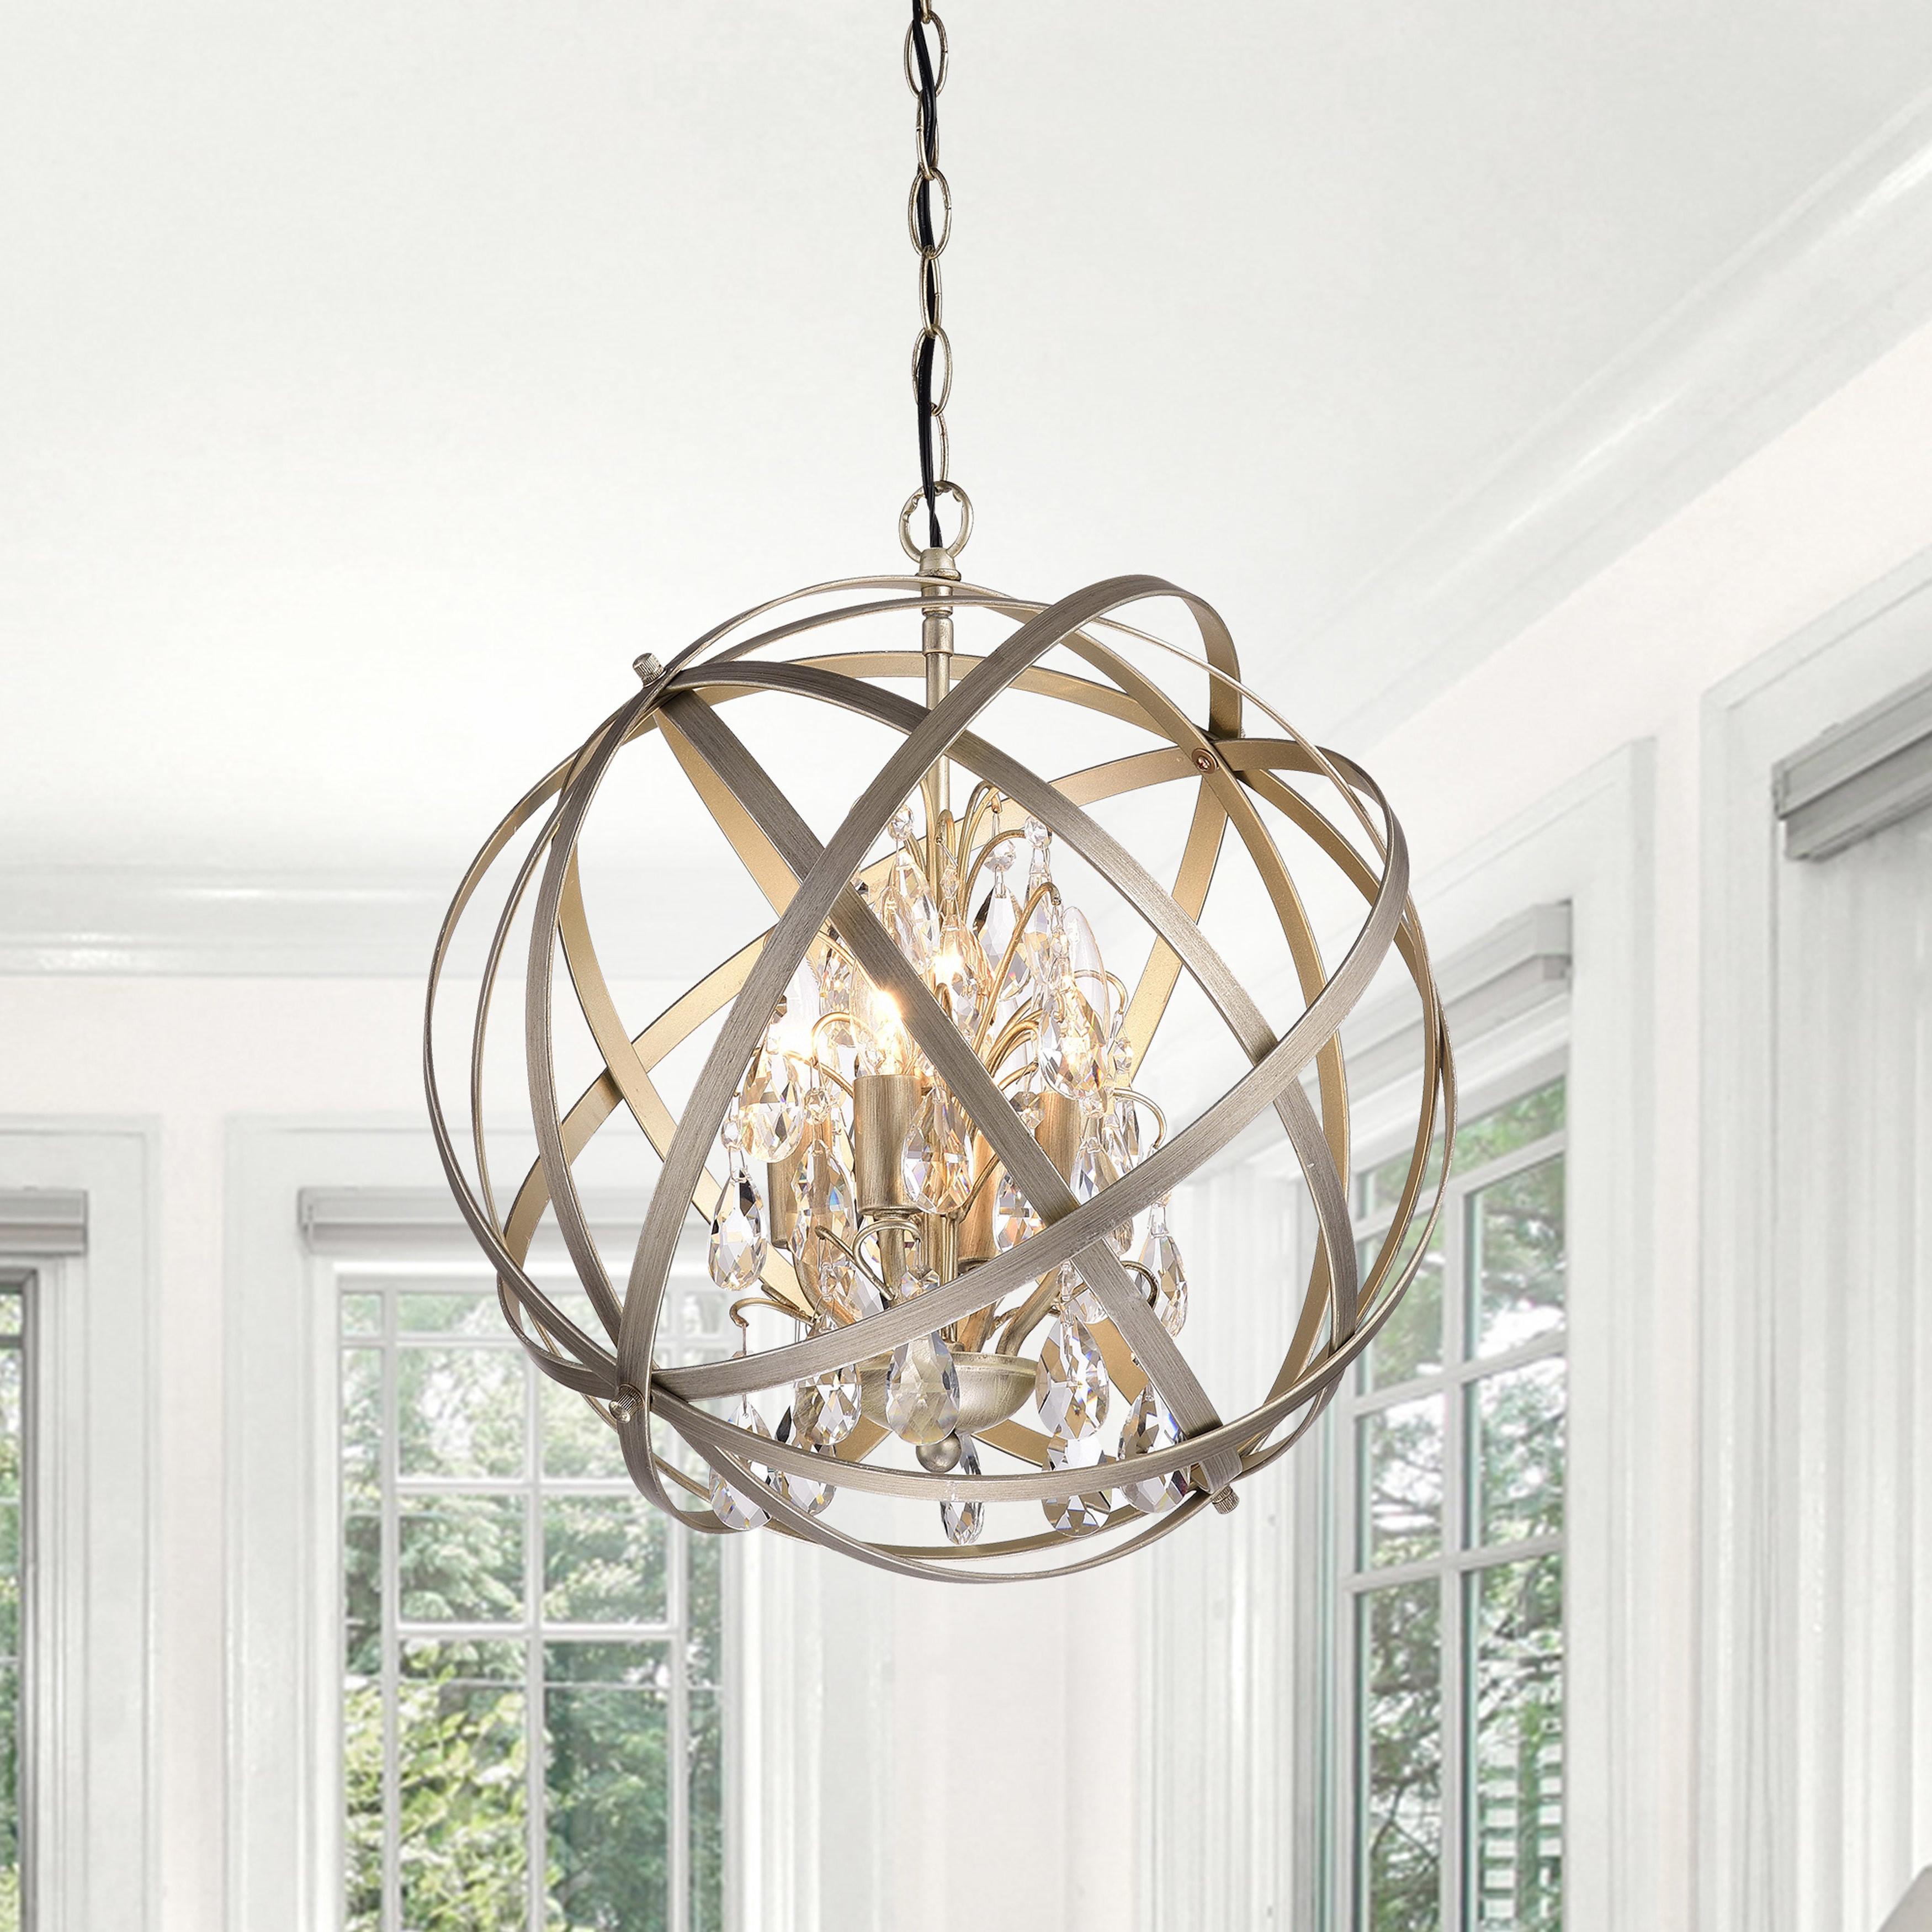 Shop Our Best Lighting & Ceiling Fans Deals (View 9 of 20)